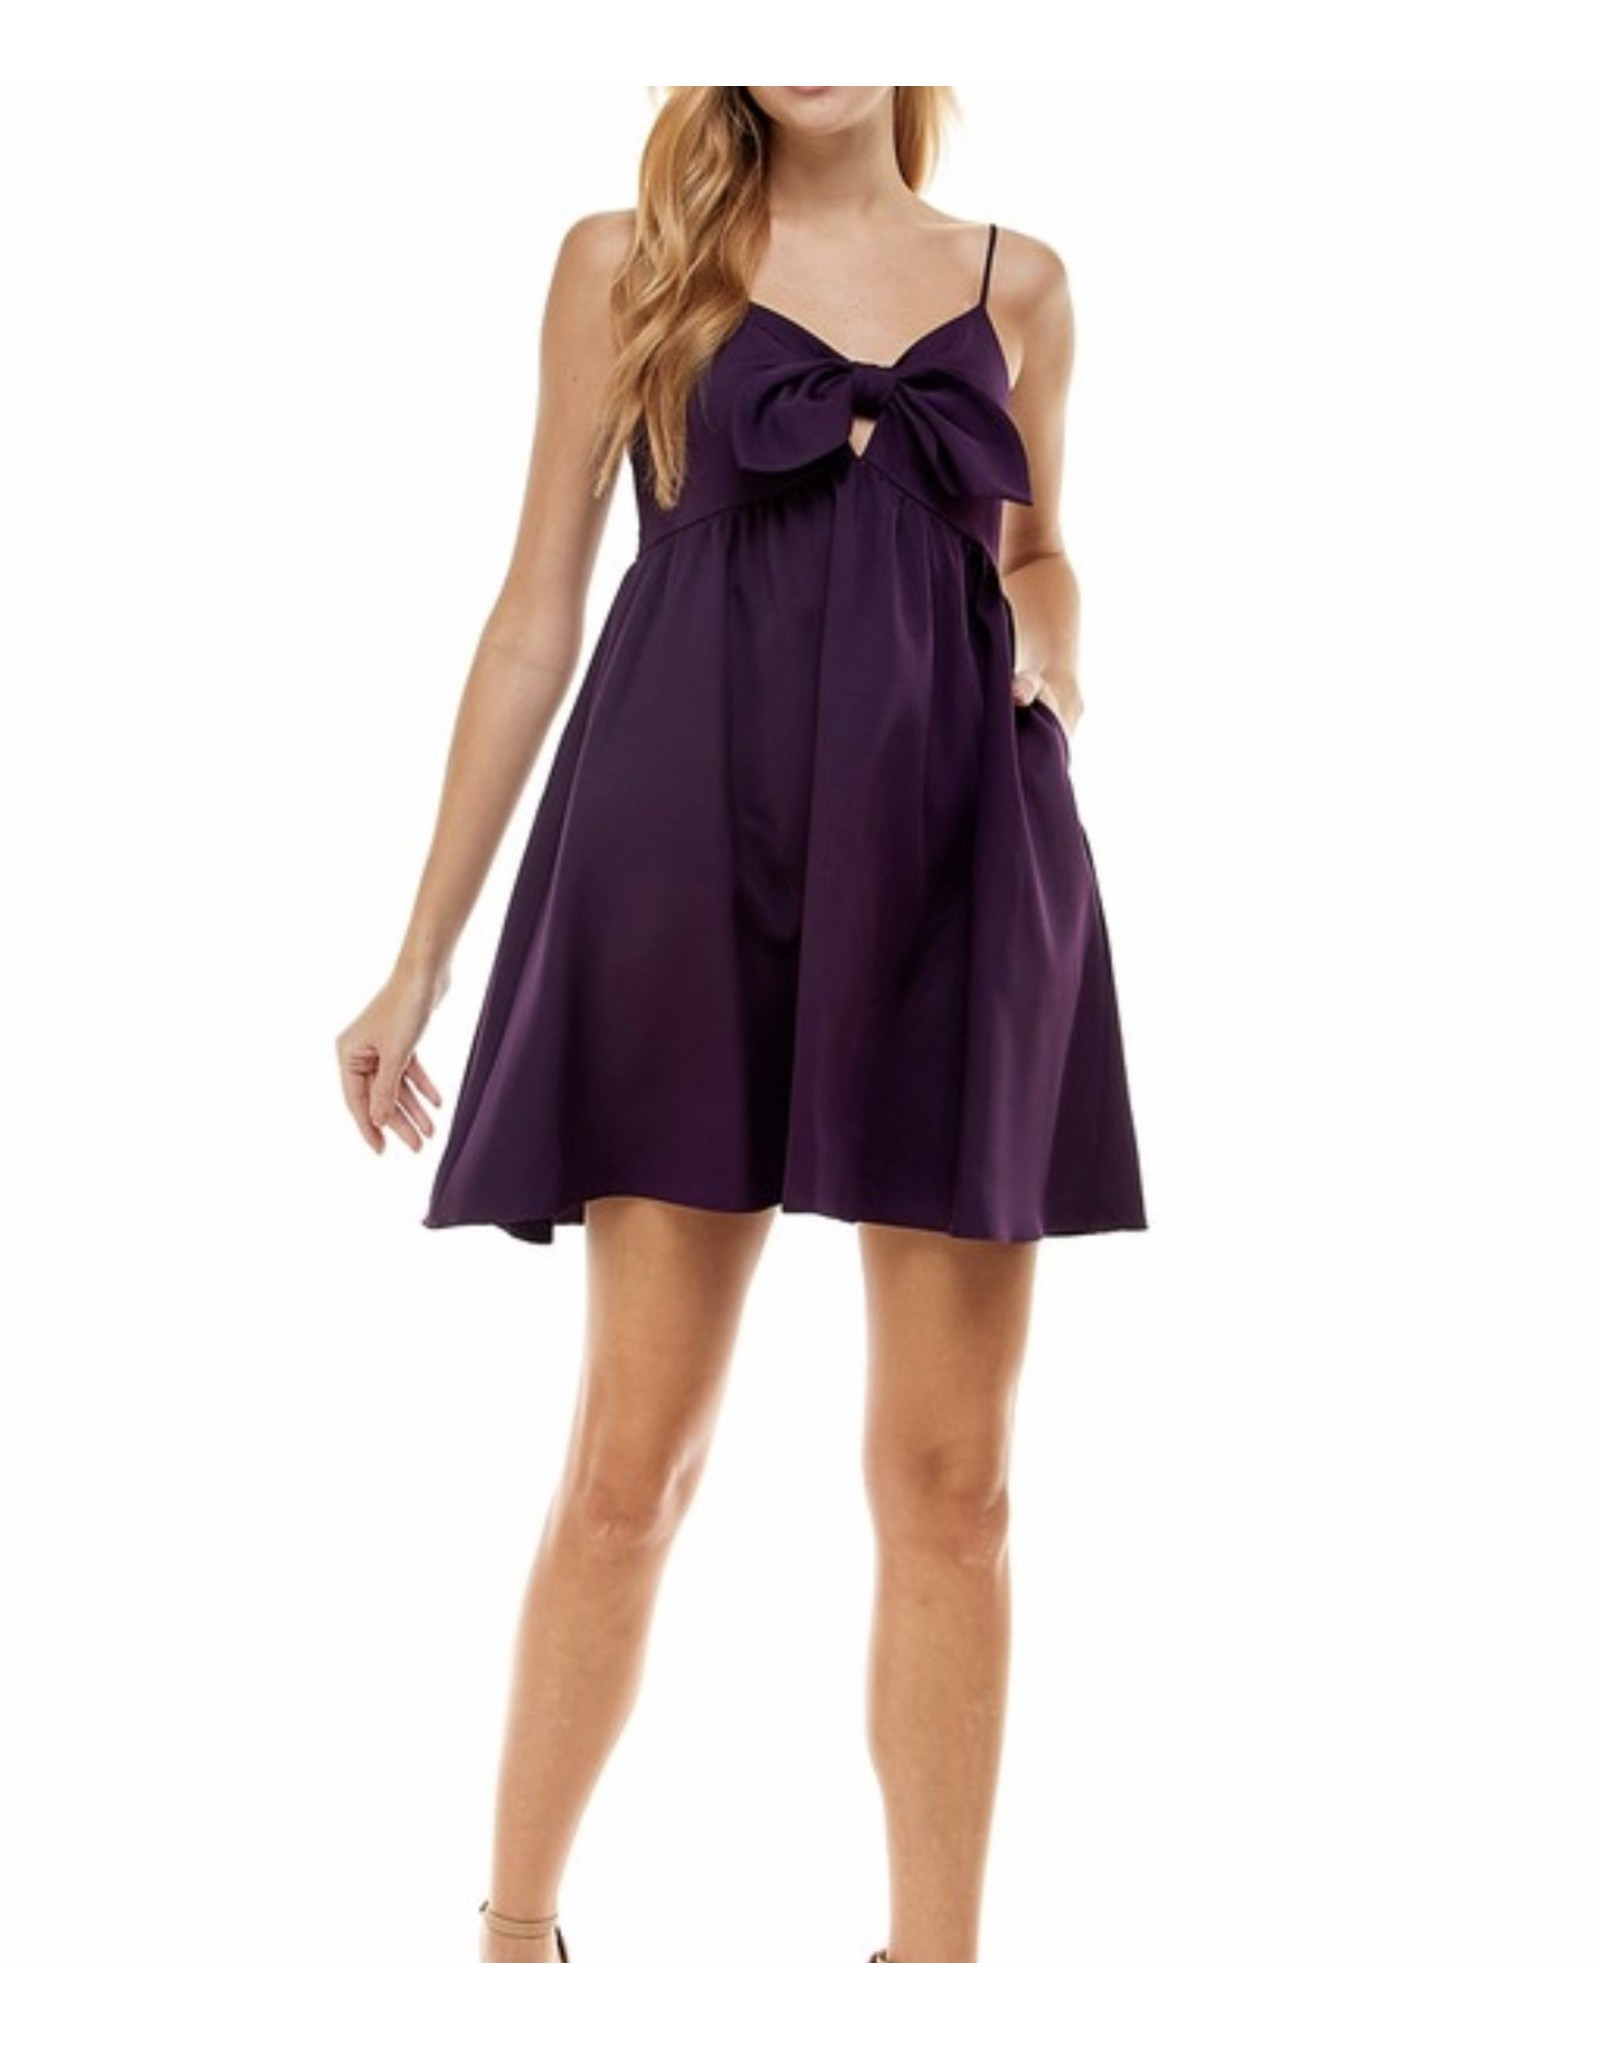 Bow Detail Dress - Purple